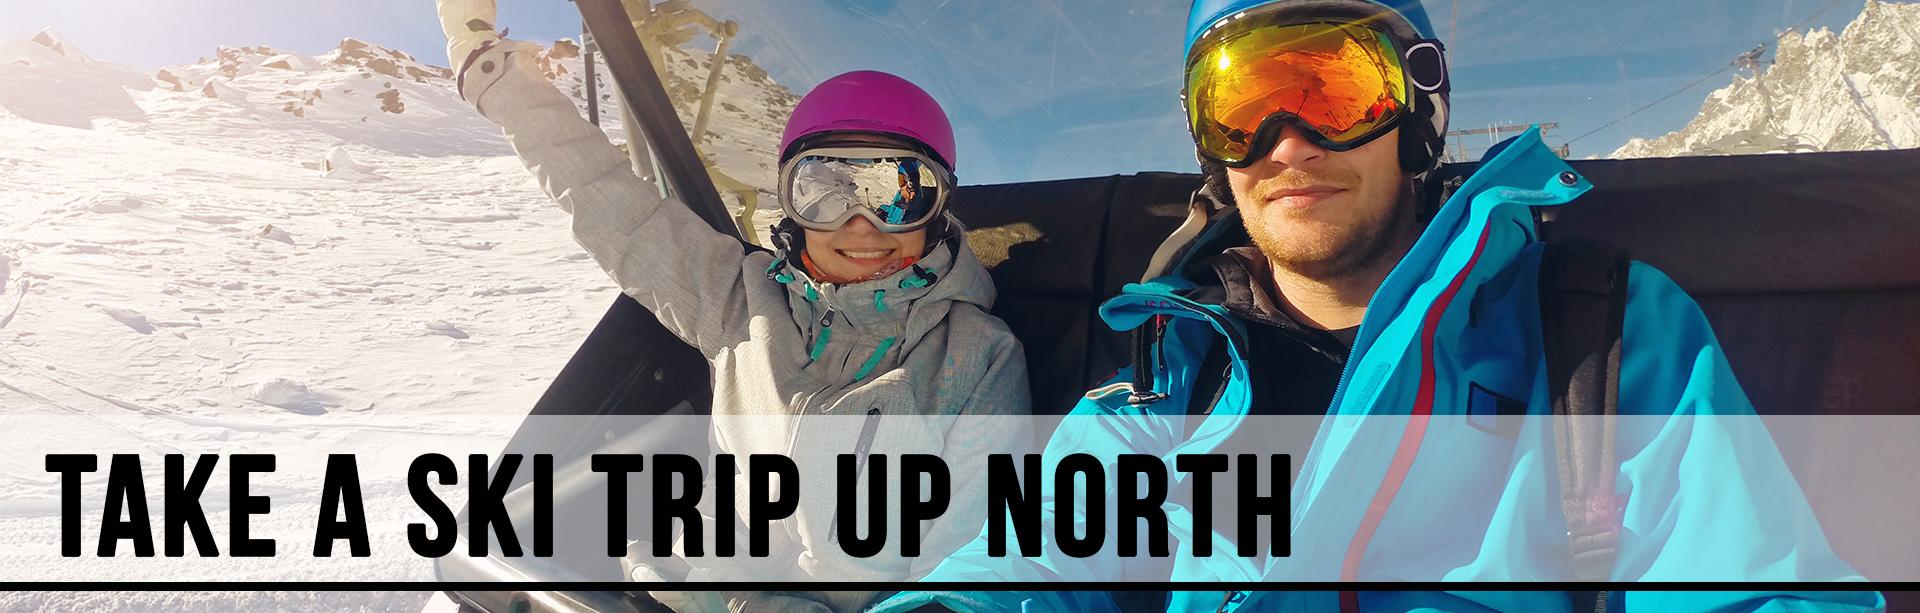 ski trip up north